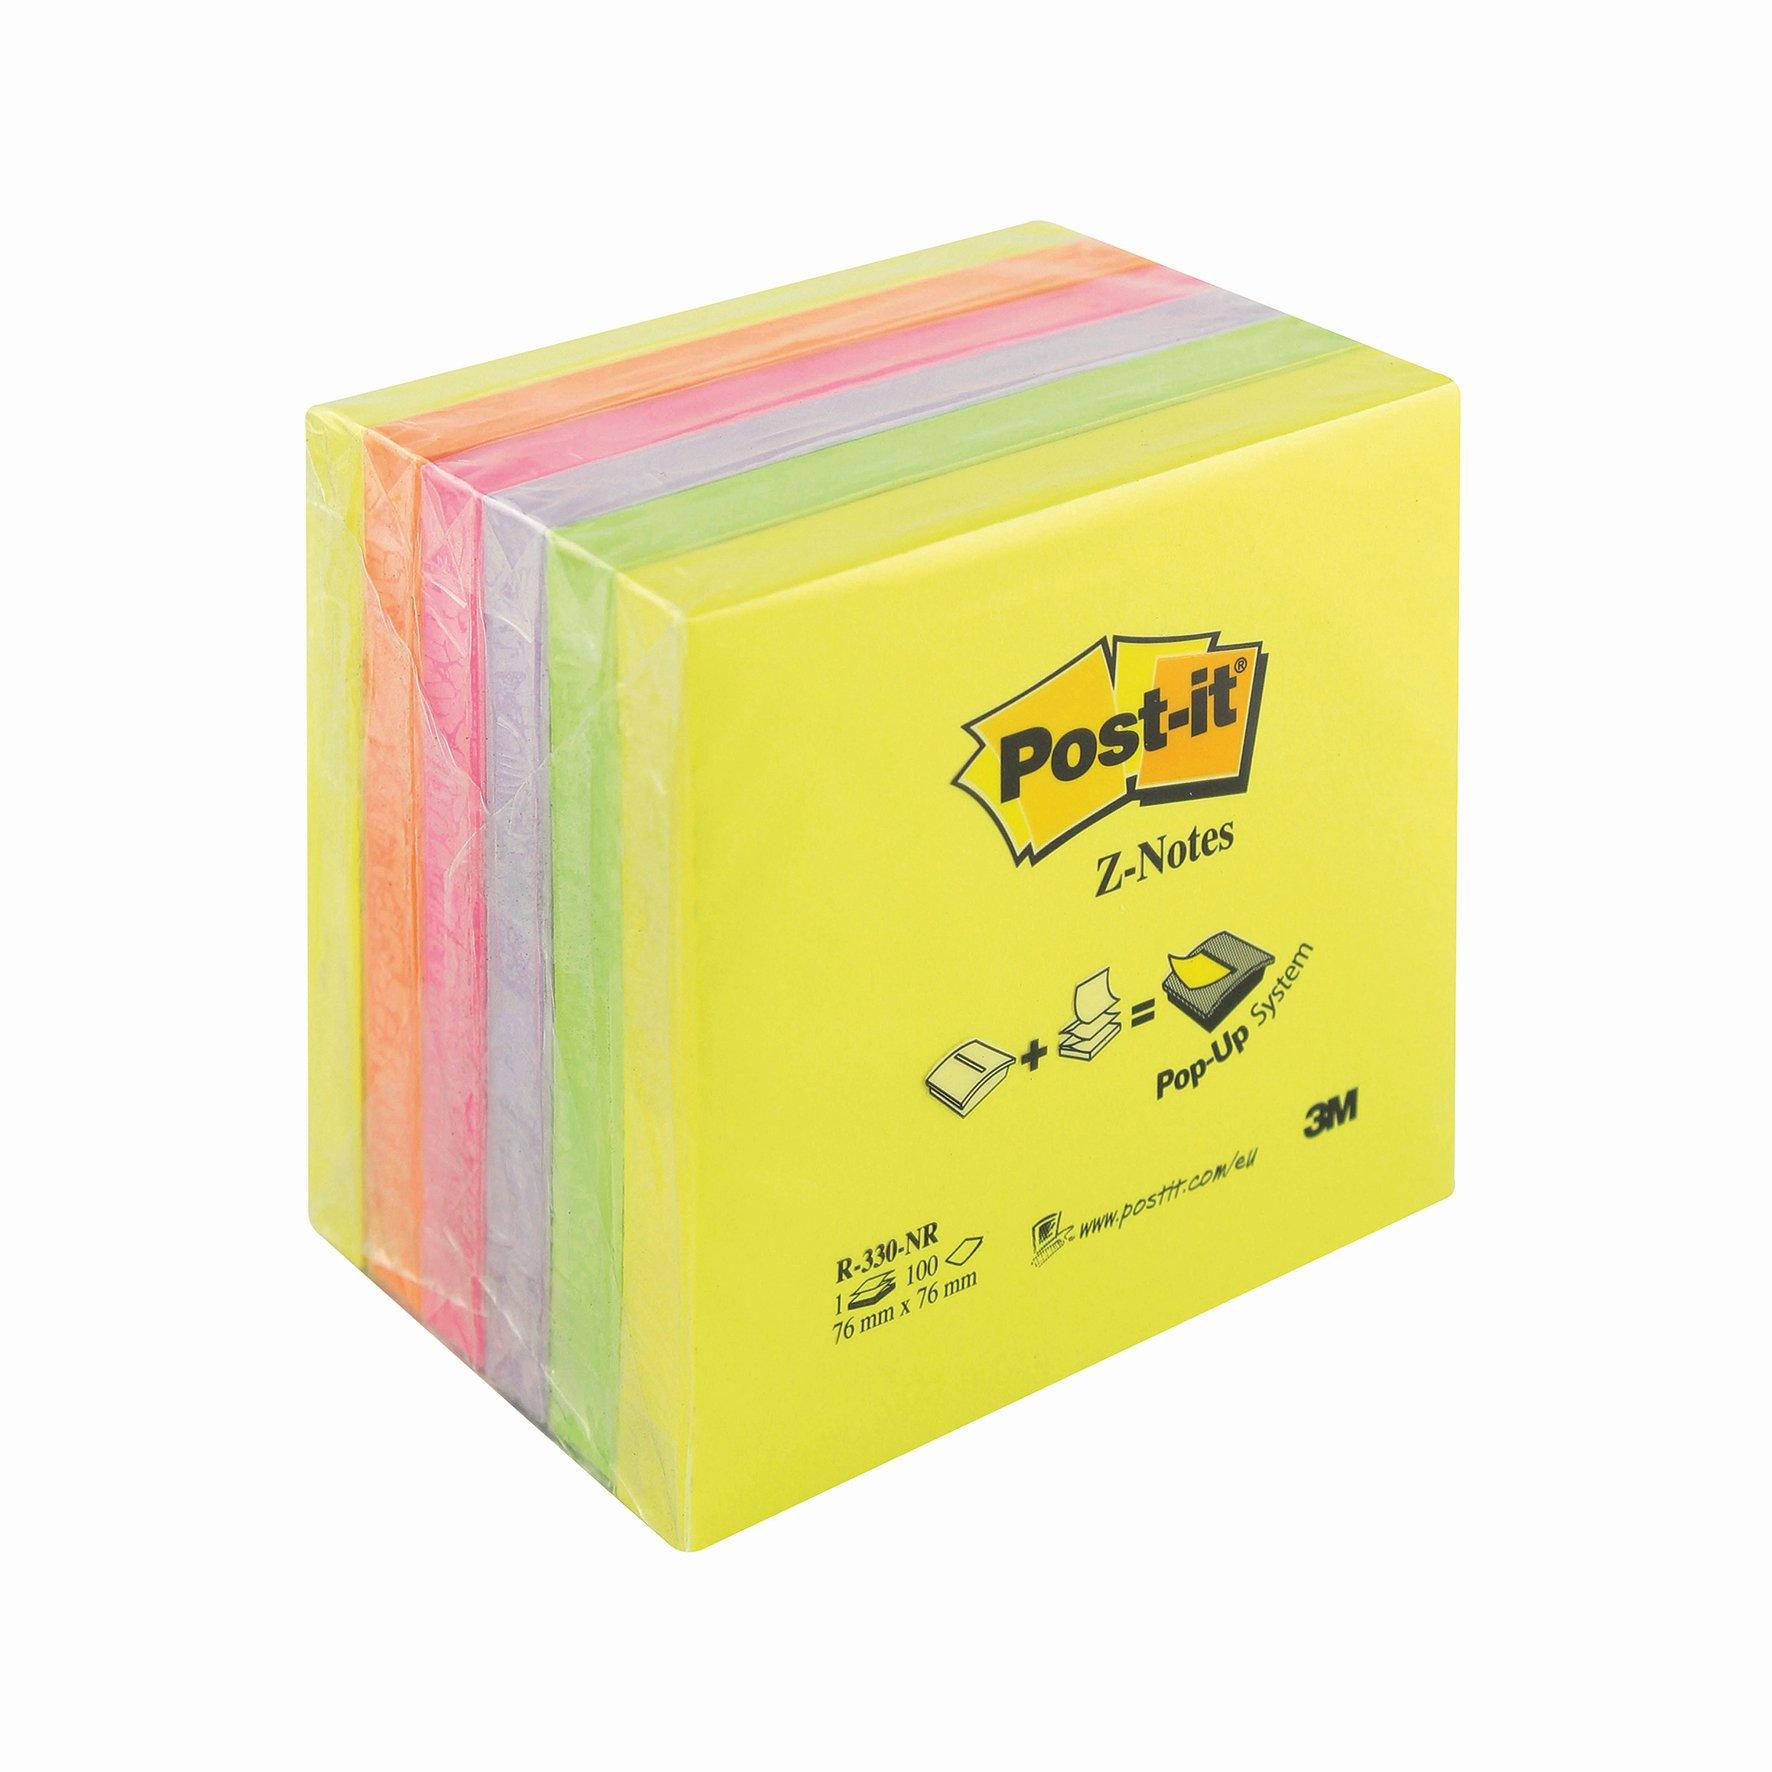 3M Post-it Z-Note 76x76mm Neon Rainbow (6) R330NR